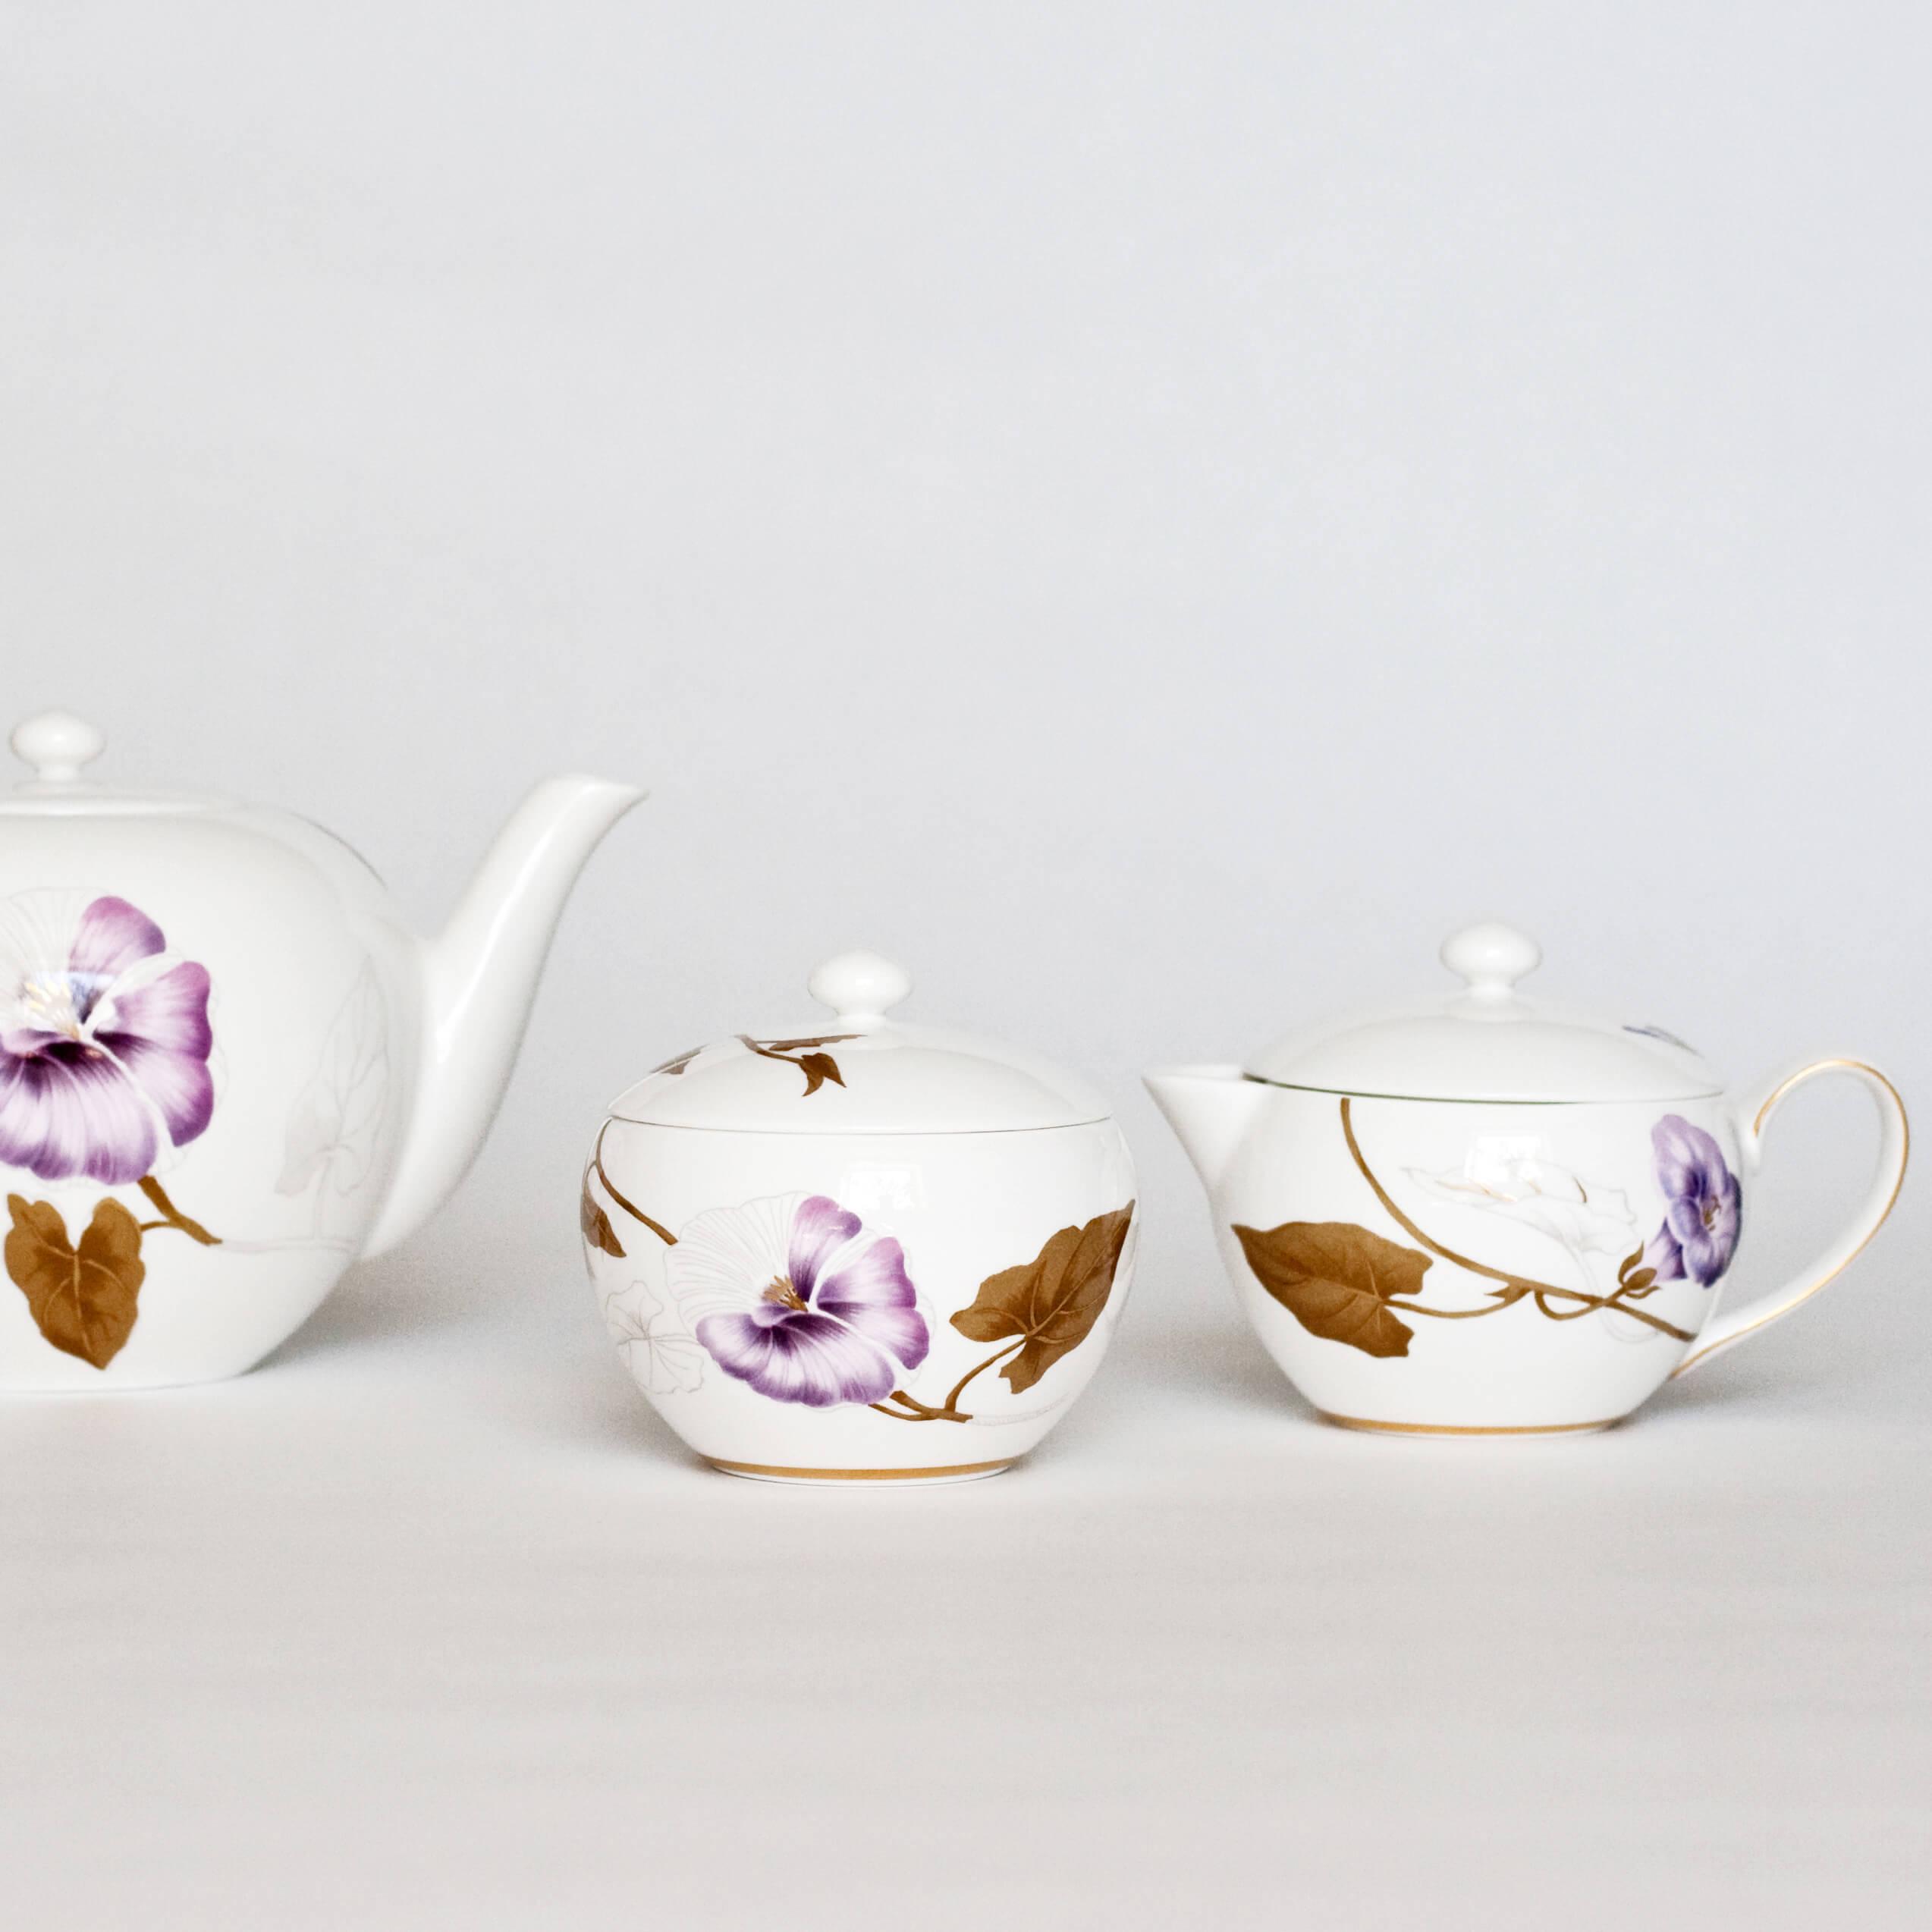 Lej flora royal copenhagen kaffestel_a table story eksklusiv serviceudlejning5